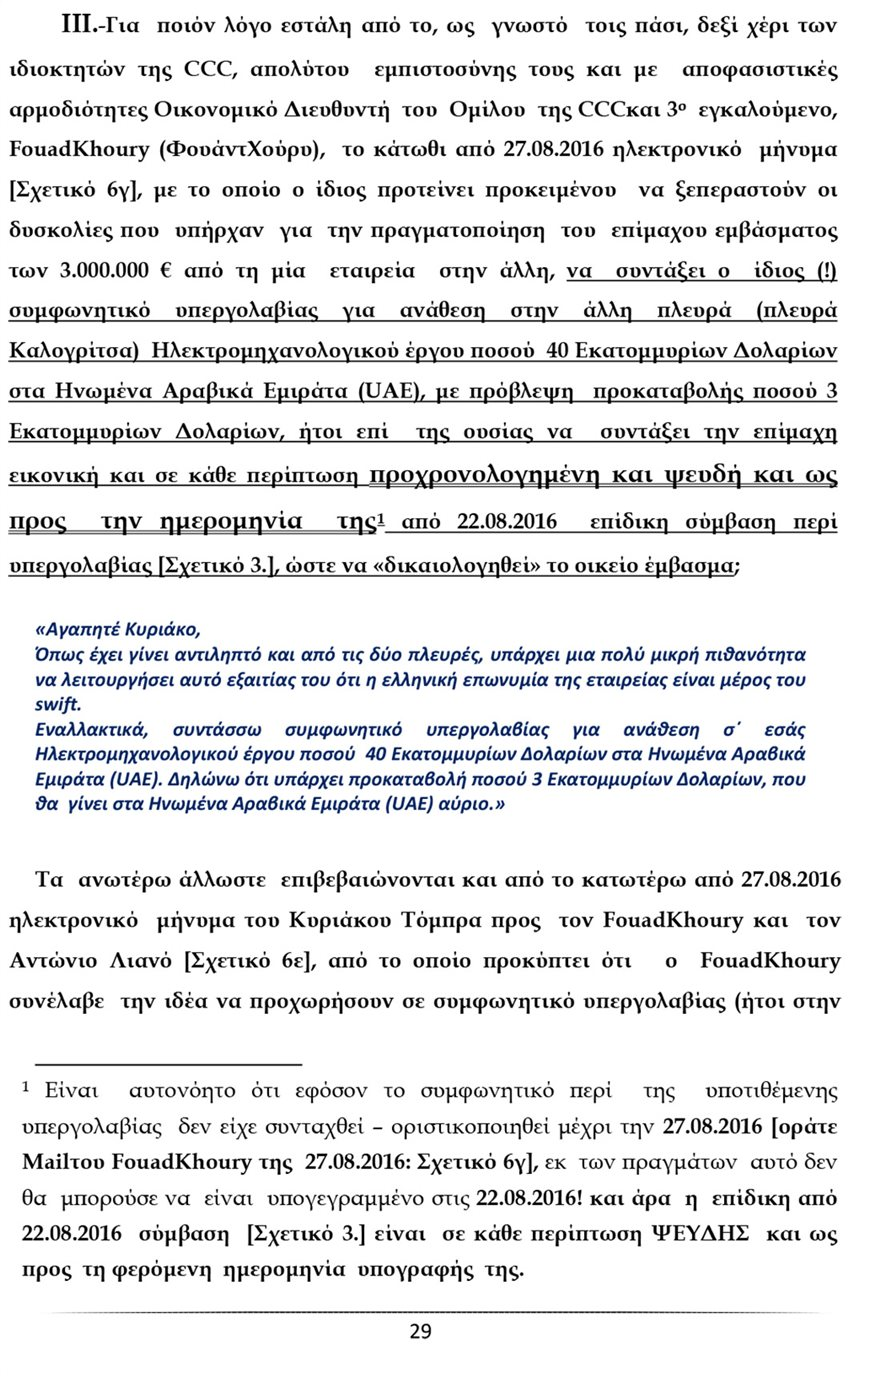 ypomnima-29